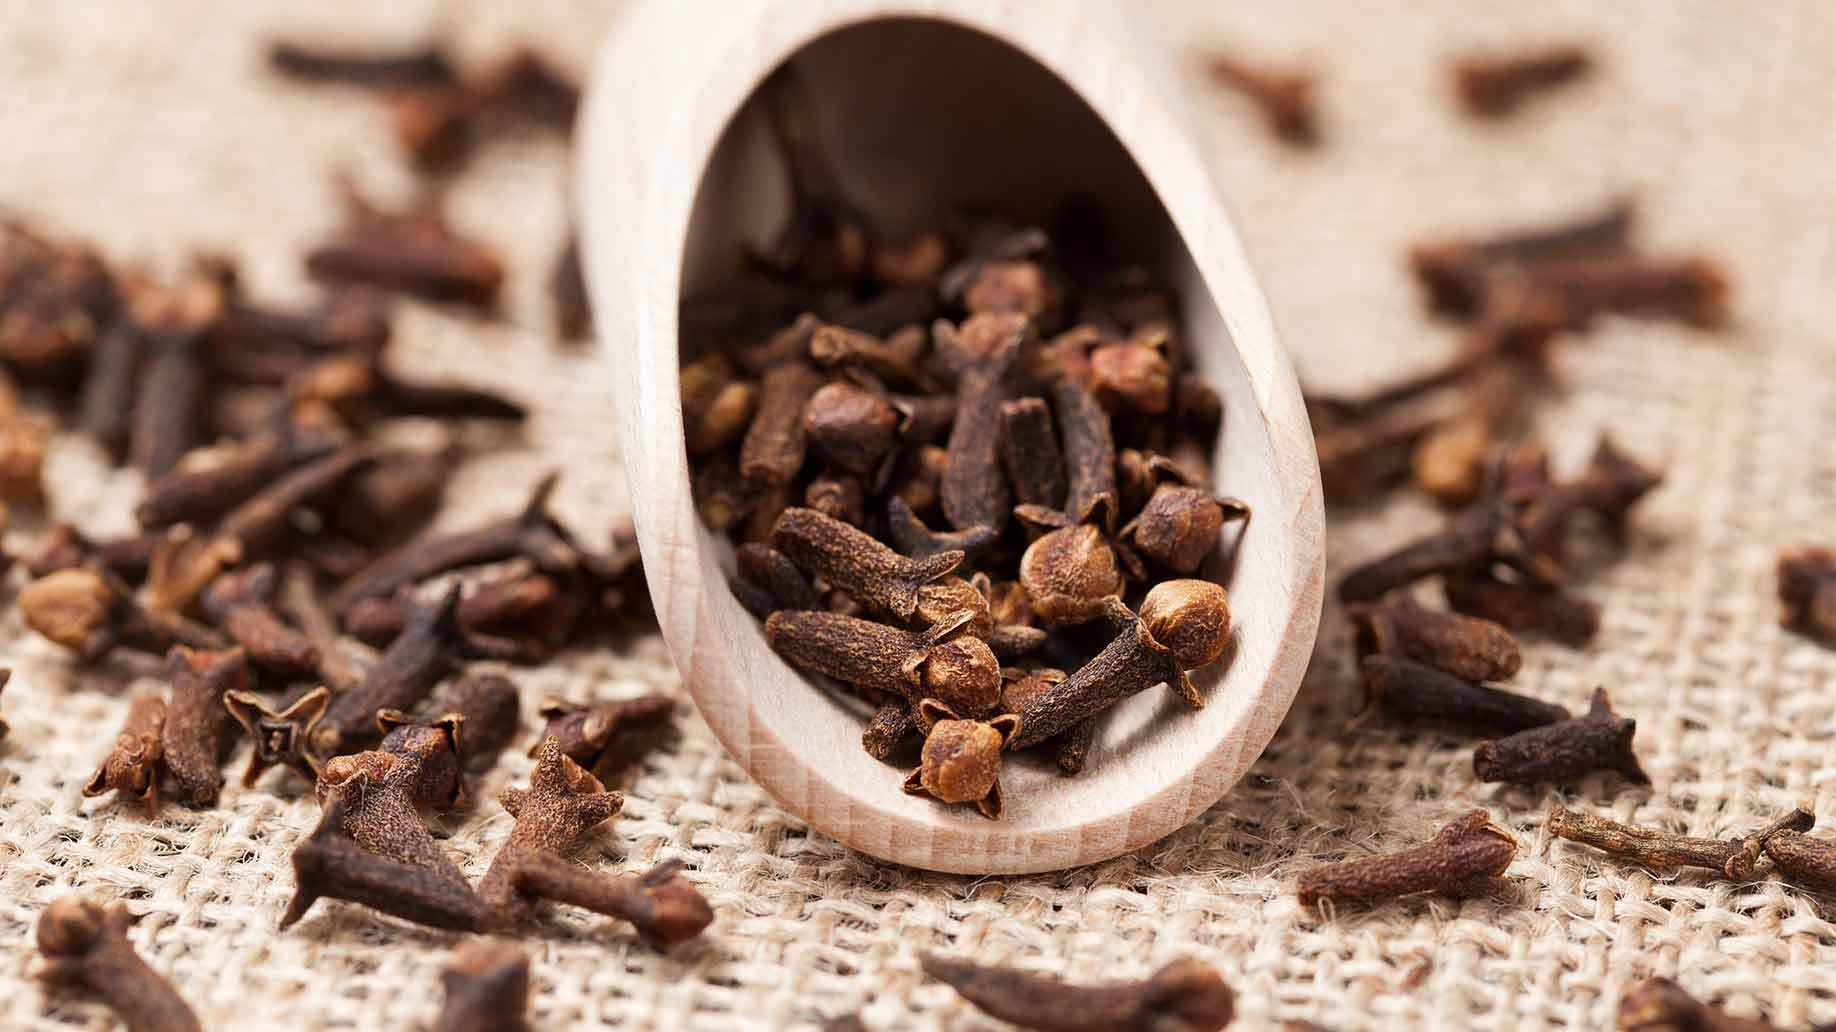 clove-essential-oil-antimicrobial-antioxidant-anti-fungal